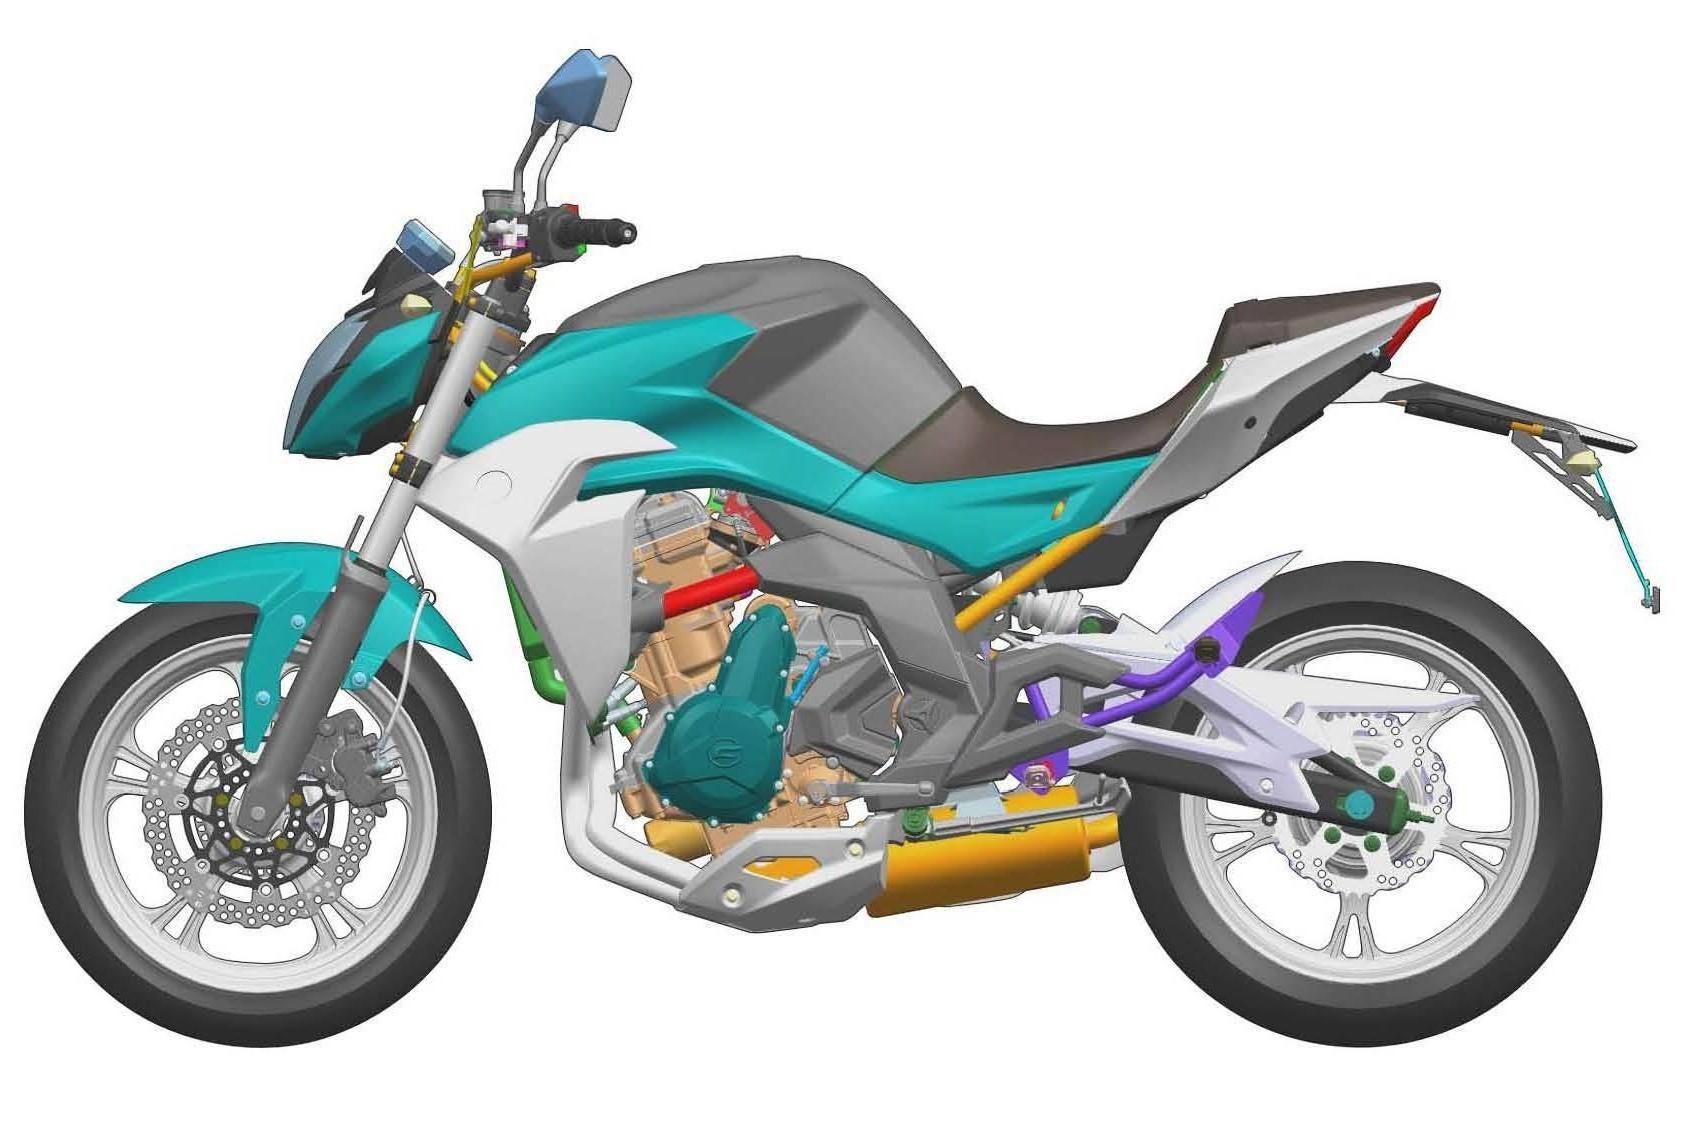 WK 650 facelift revealed